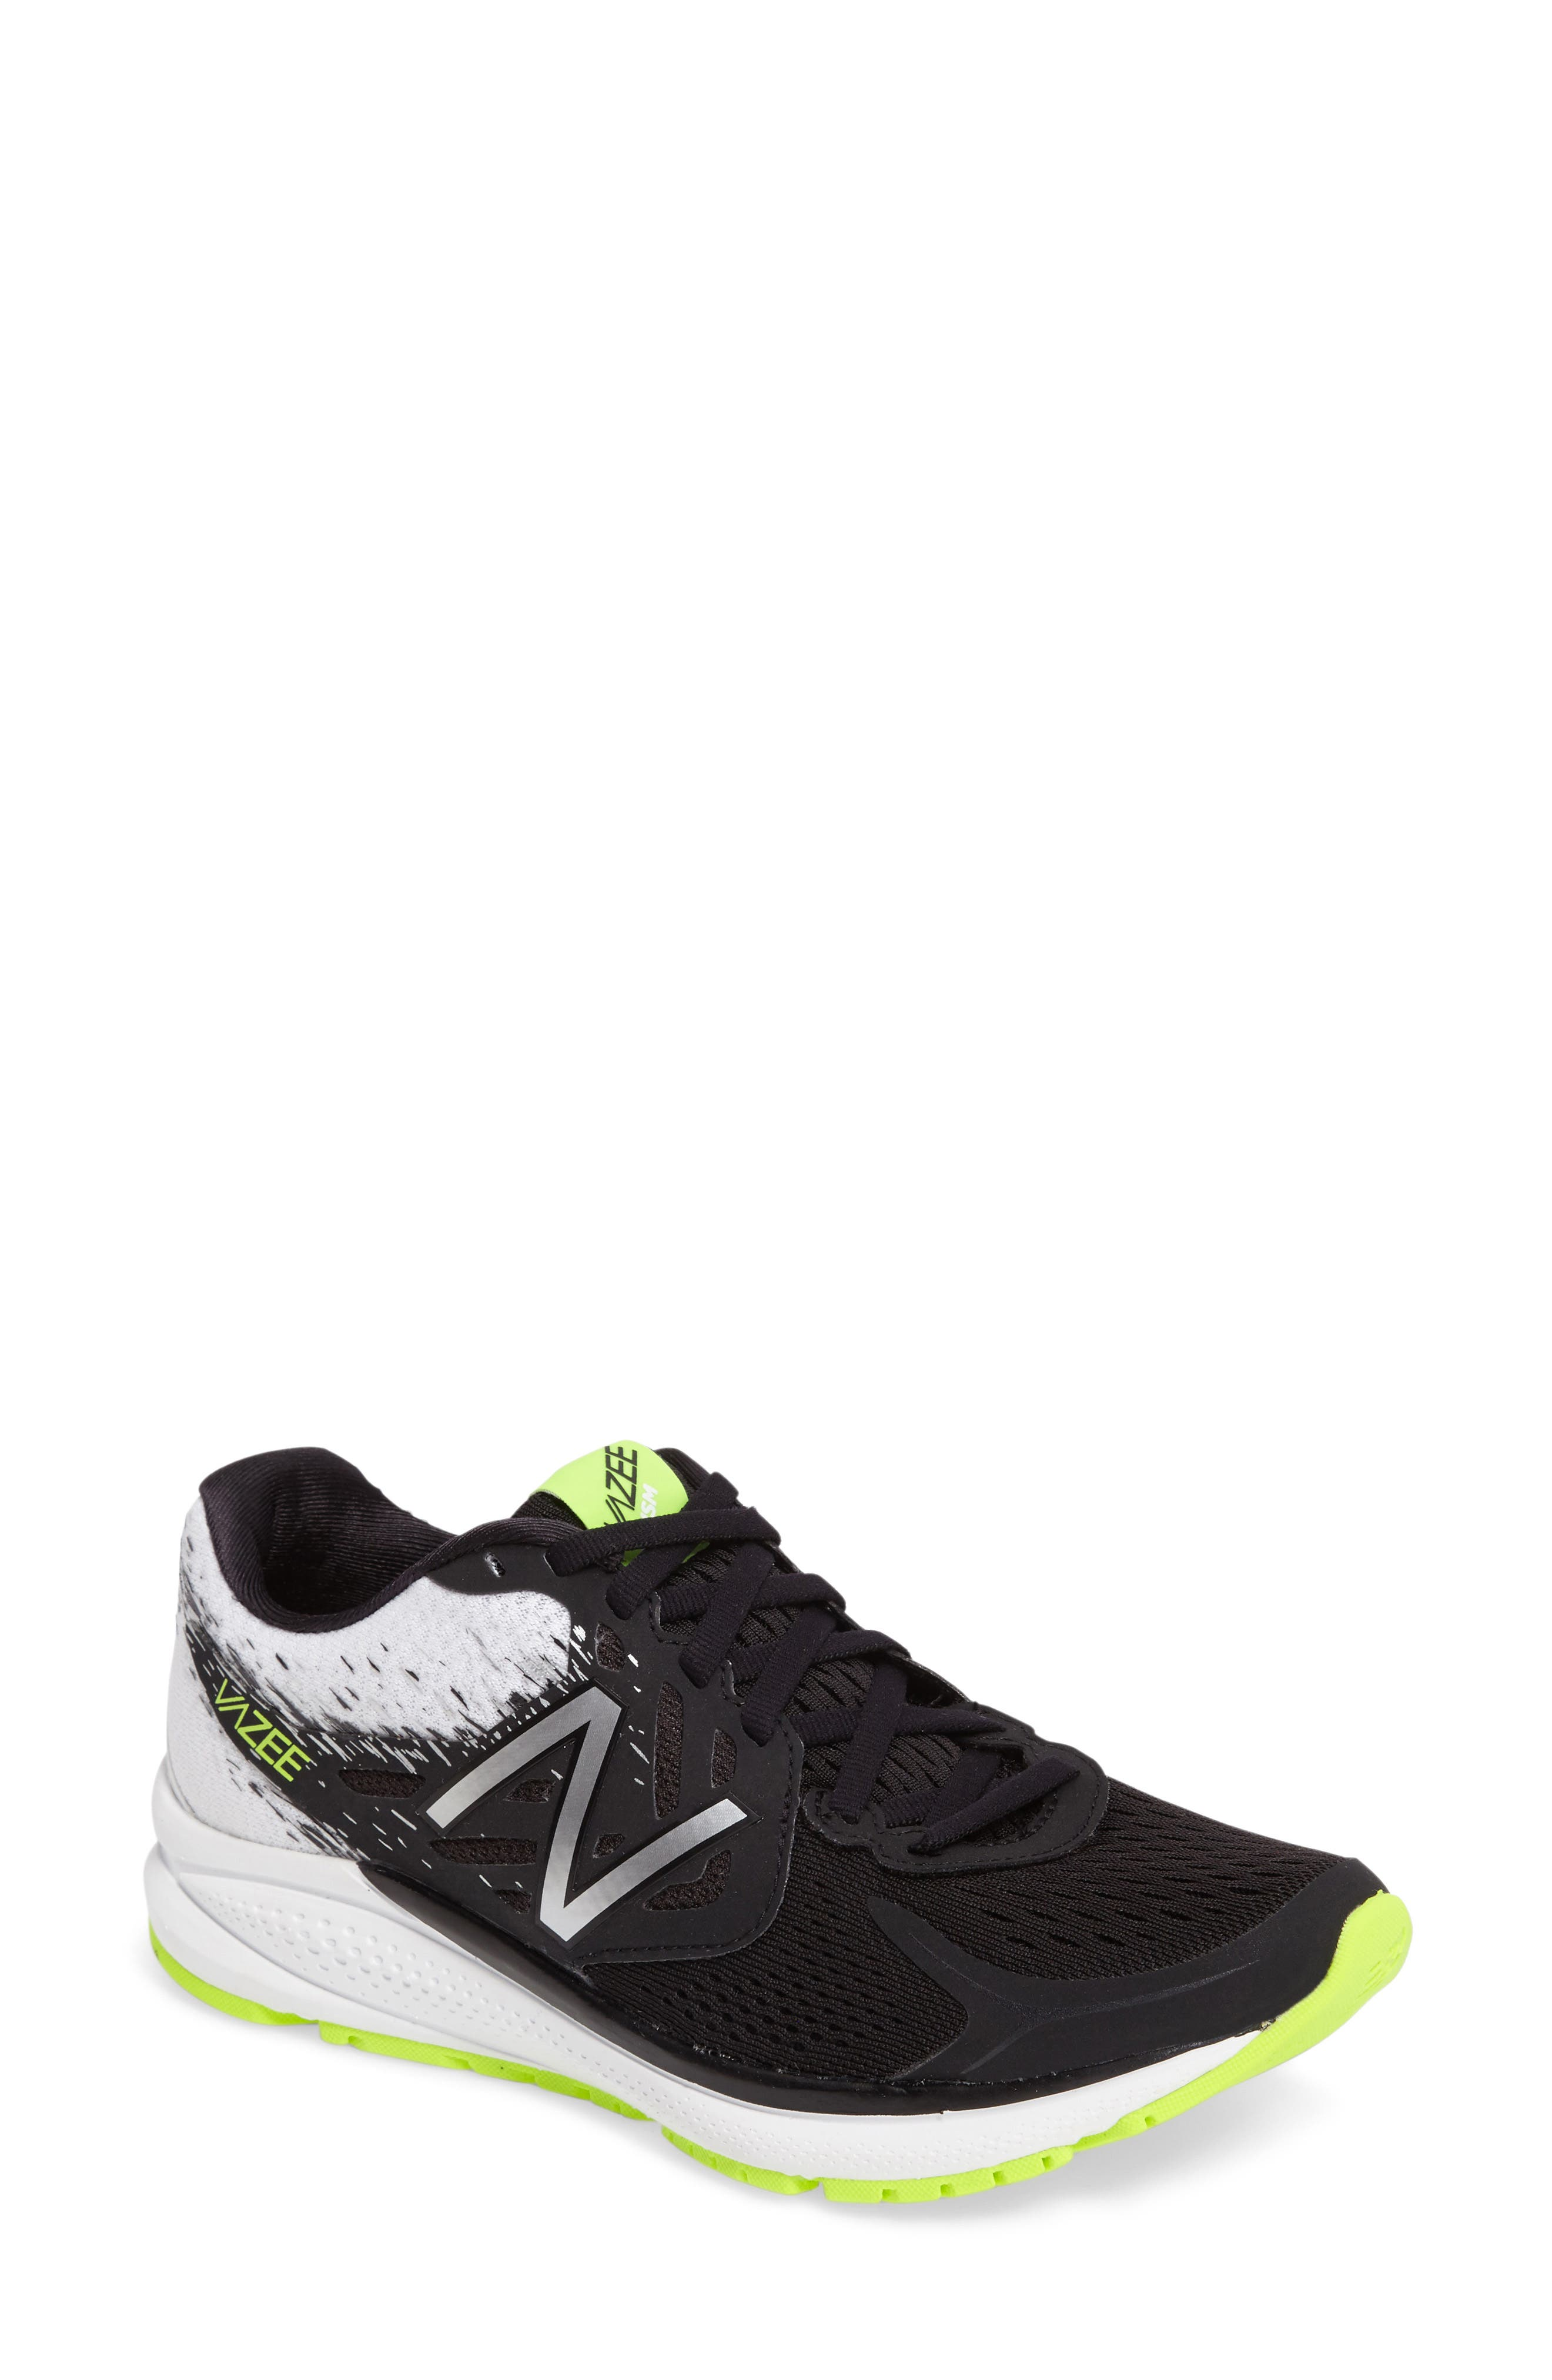 Alternate Image 1 Selected - New Balance 'Vazee Prism' Running Shoe (Women)